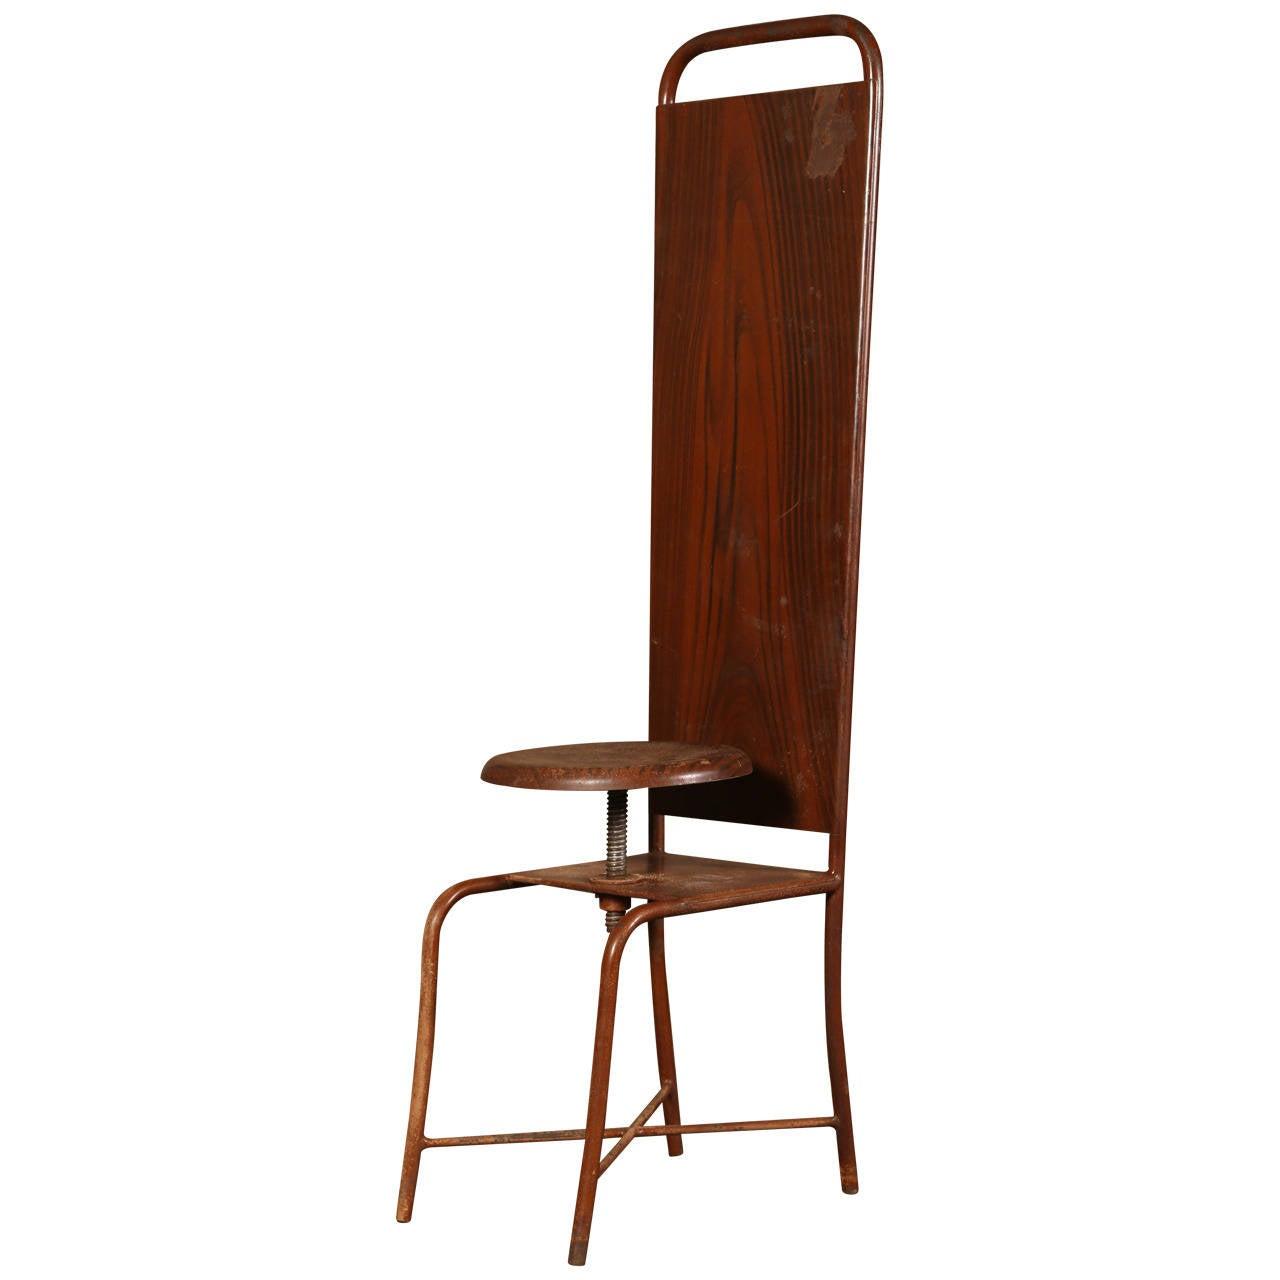 united chair medical stool folding pepperfry original vintage adjustable or at 1stdibs for sale